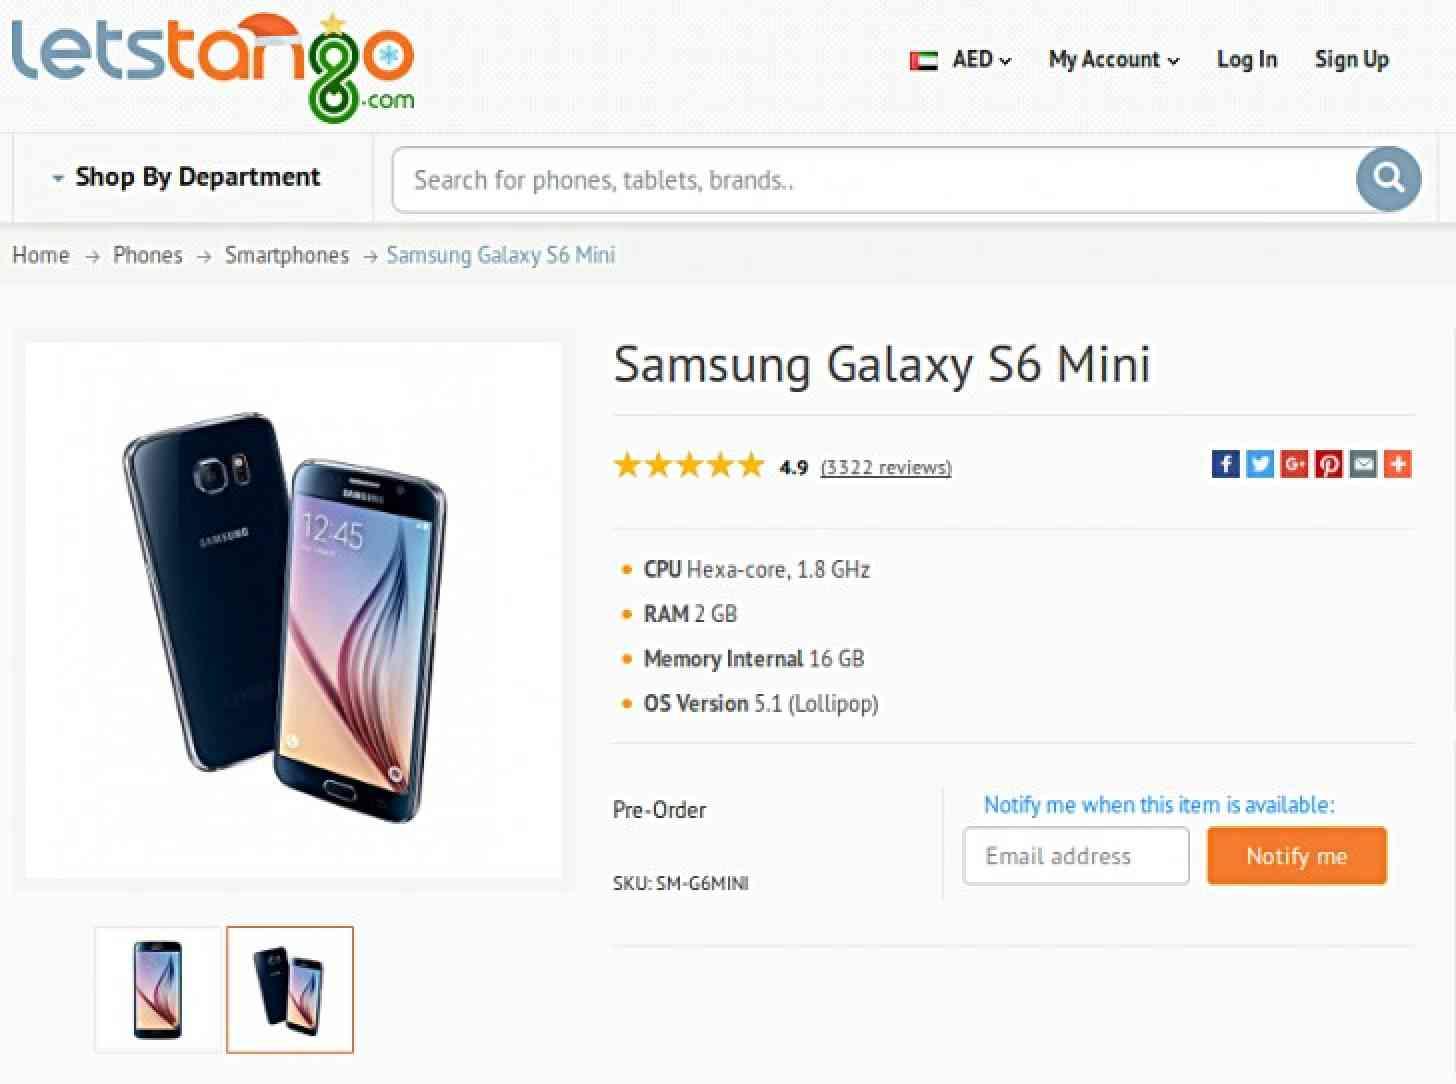 Samsung Galaxy S6 Mini rumored